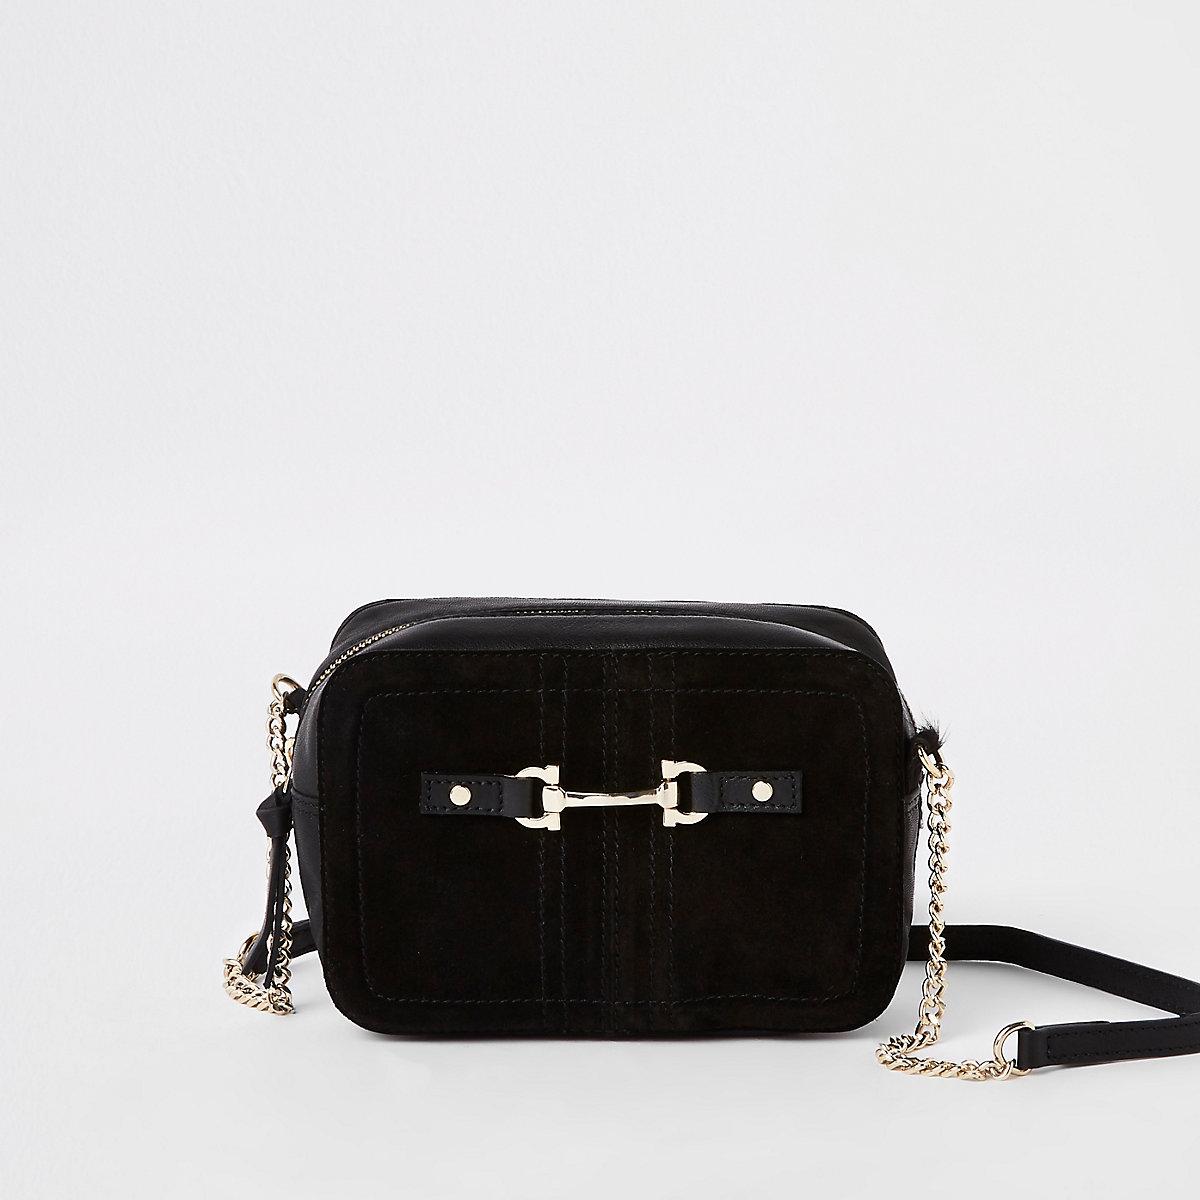 Black suede leather mini cross body bag